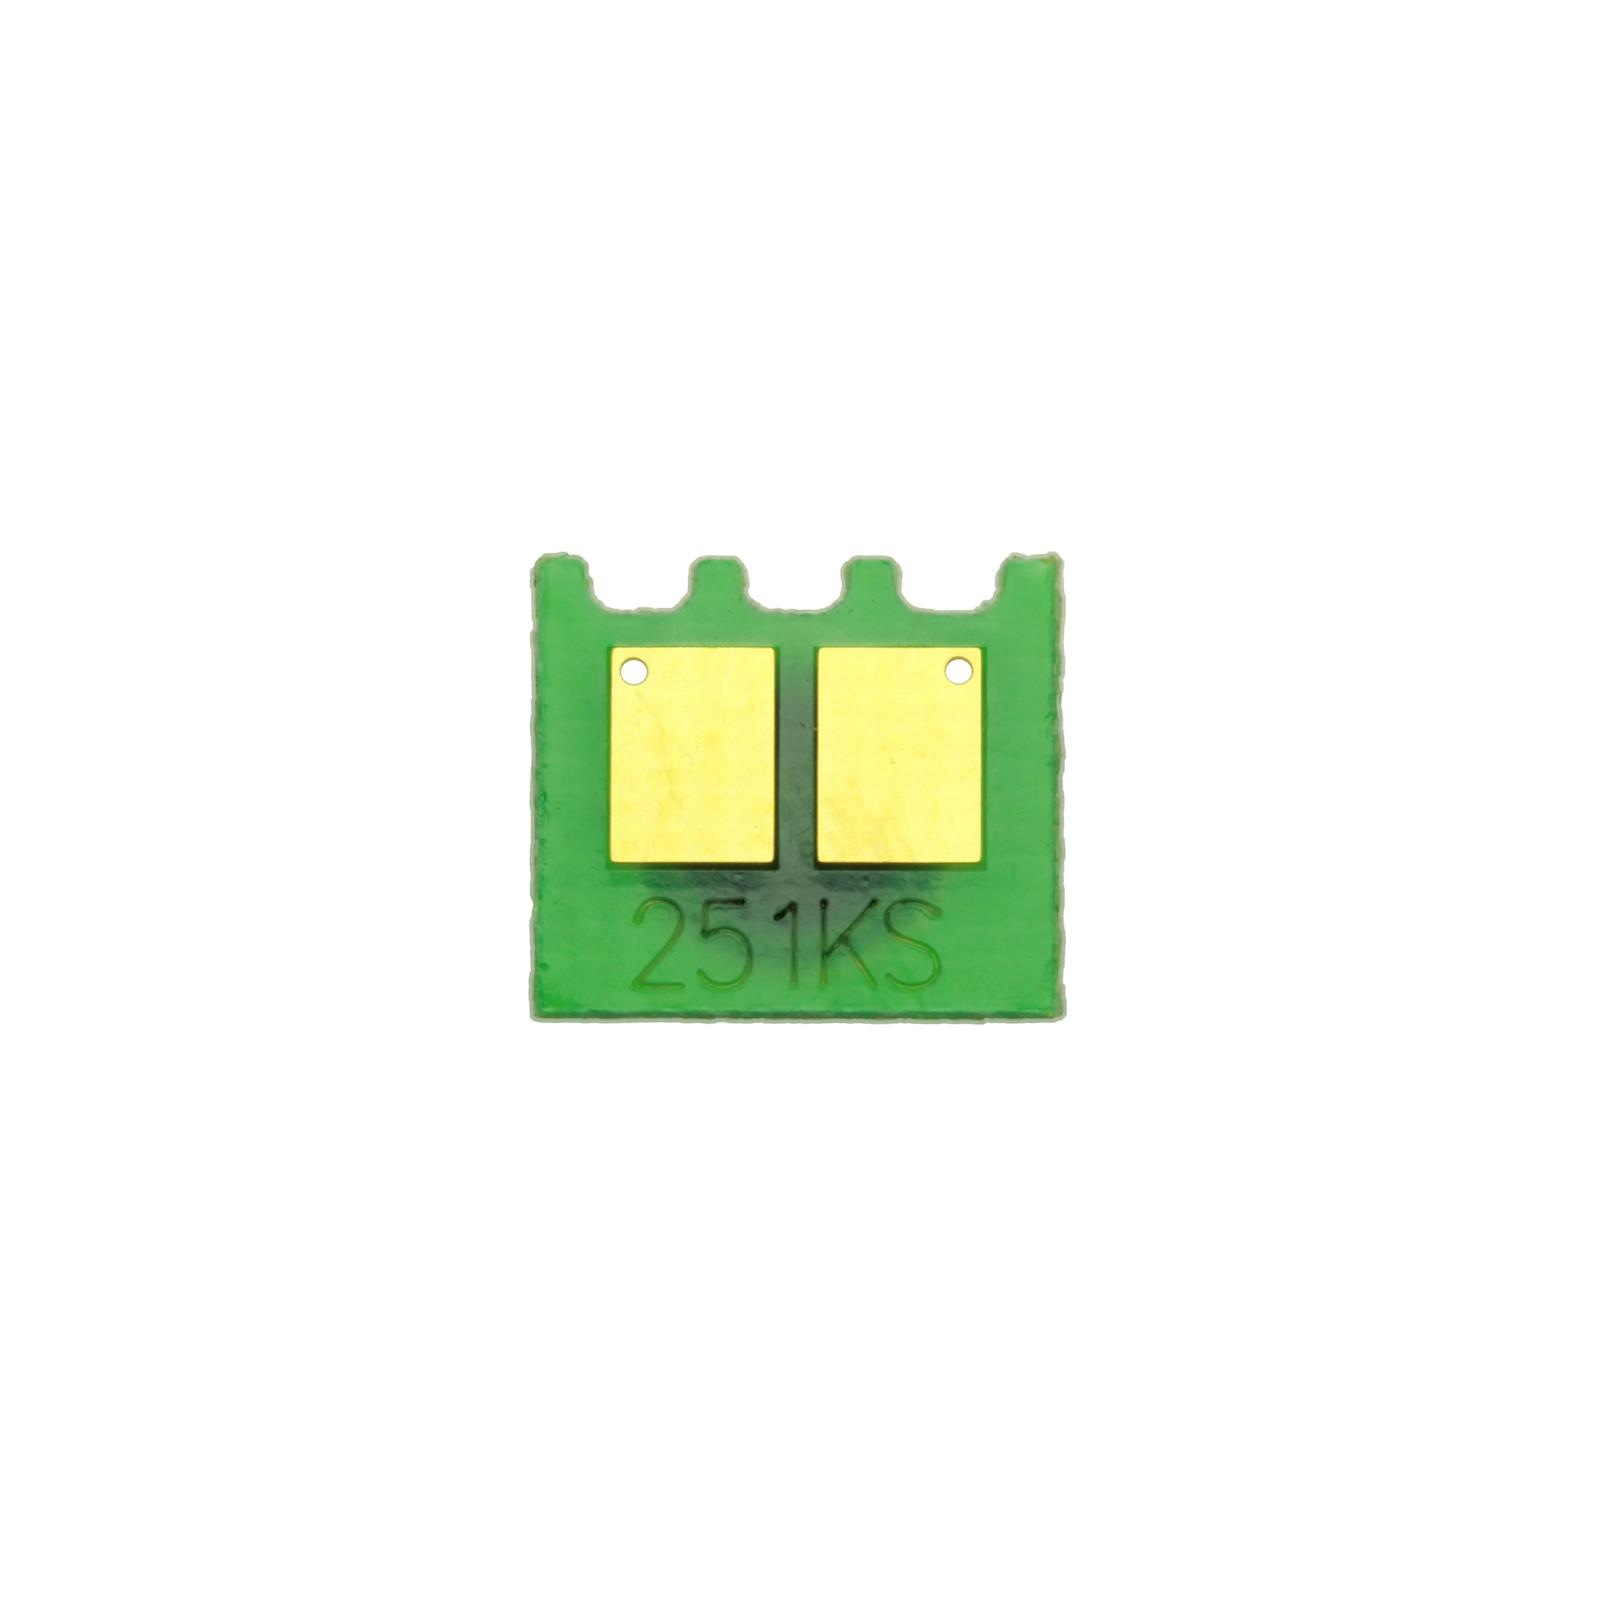 Чип для картриджа HP CLJ Pro 200 M251/M276 (CF210A) 1.6k black Static Control (HP251CHIP-LYK)